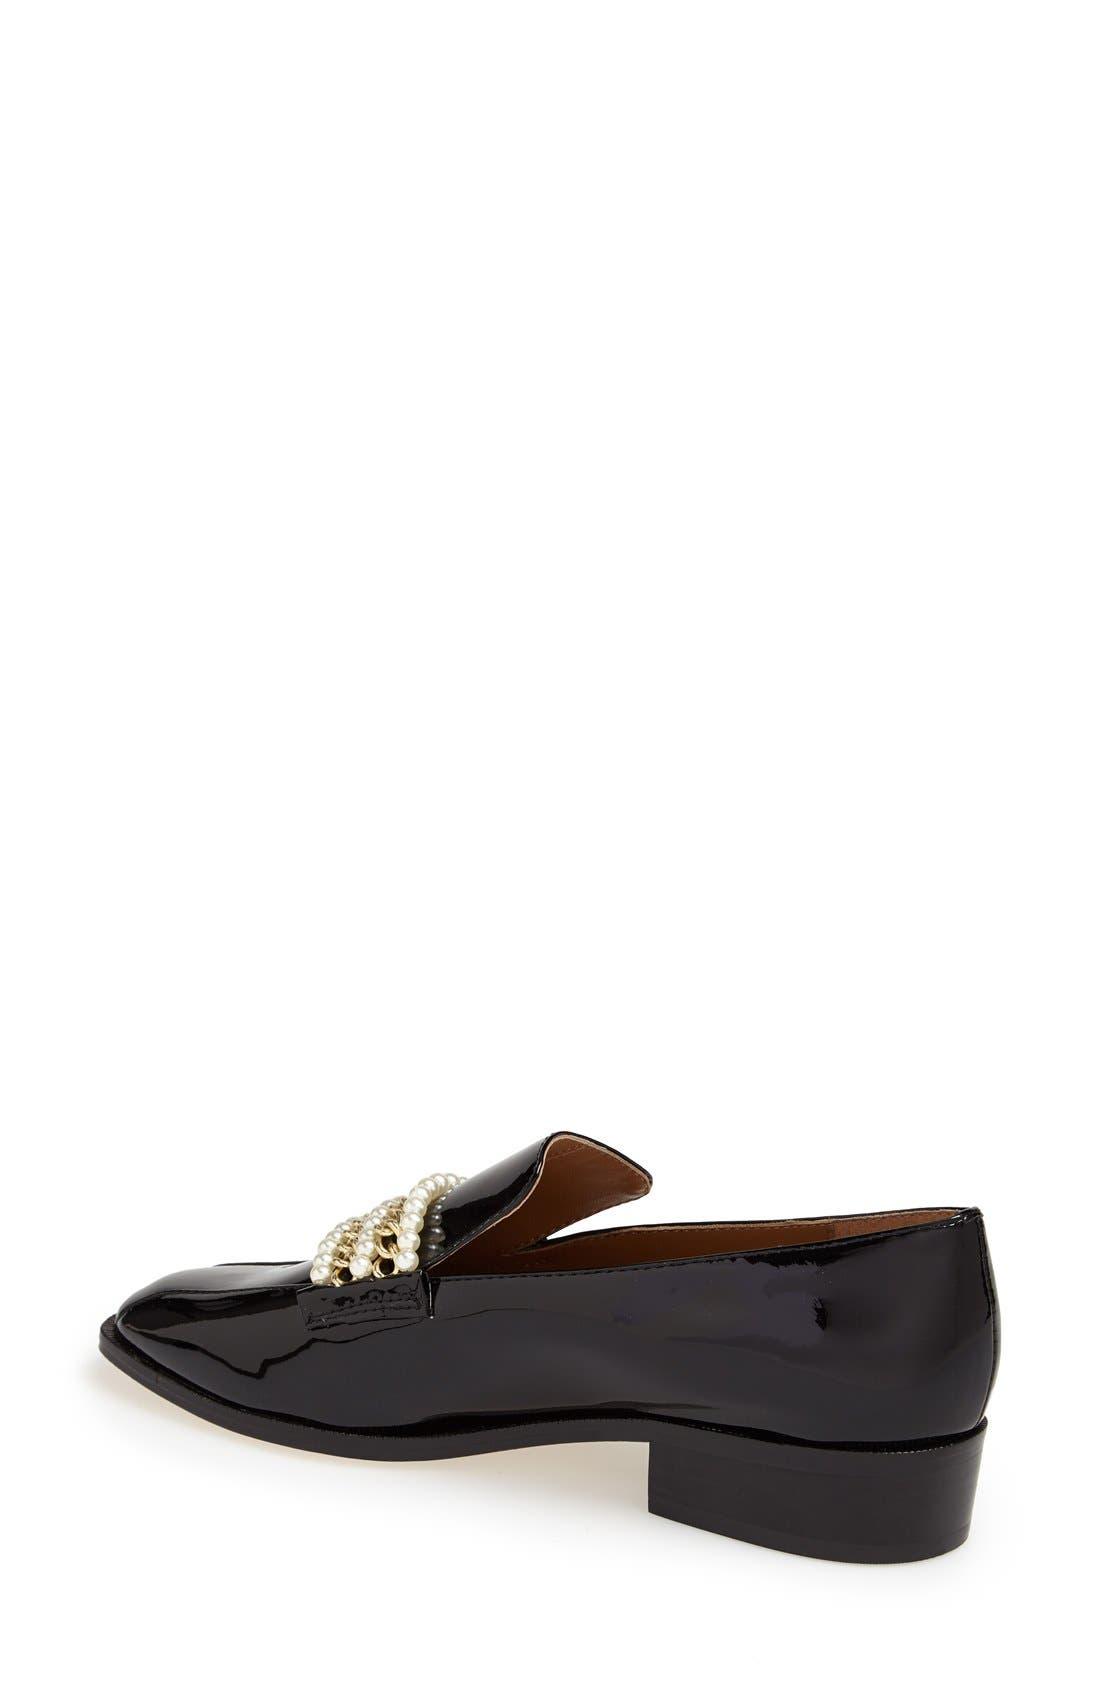 Alternate Image 2  - Bettye Muller 'Pearl' Patent Leather Loafer (Women)